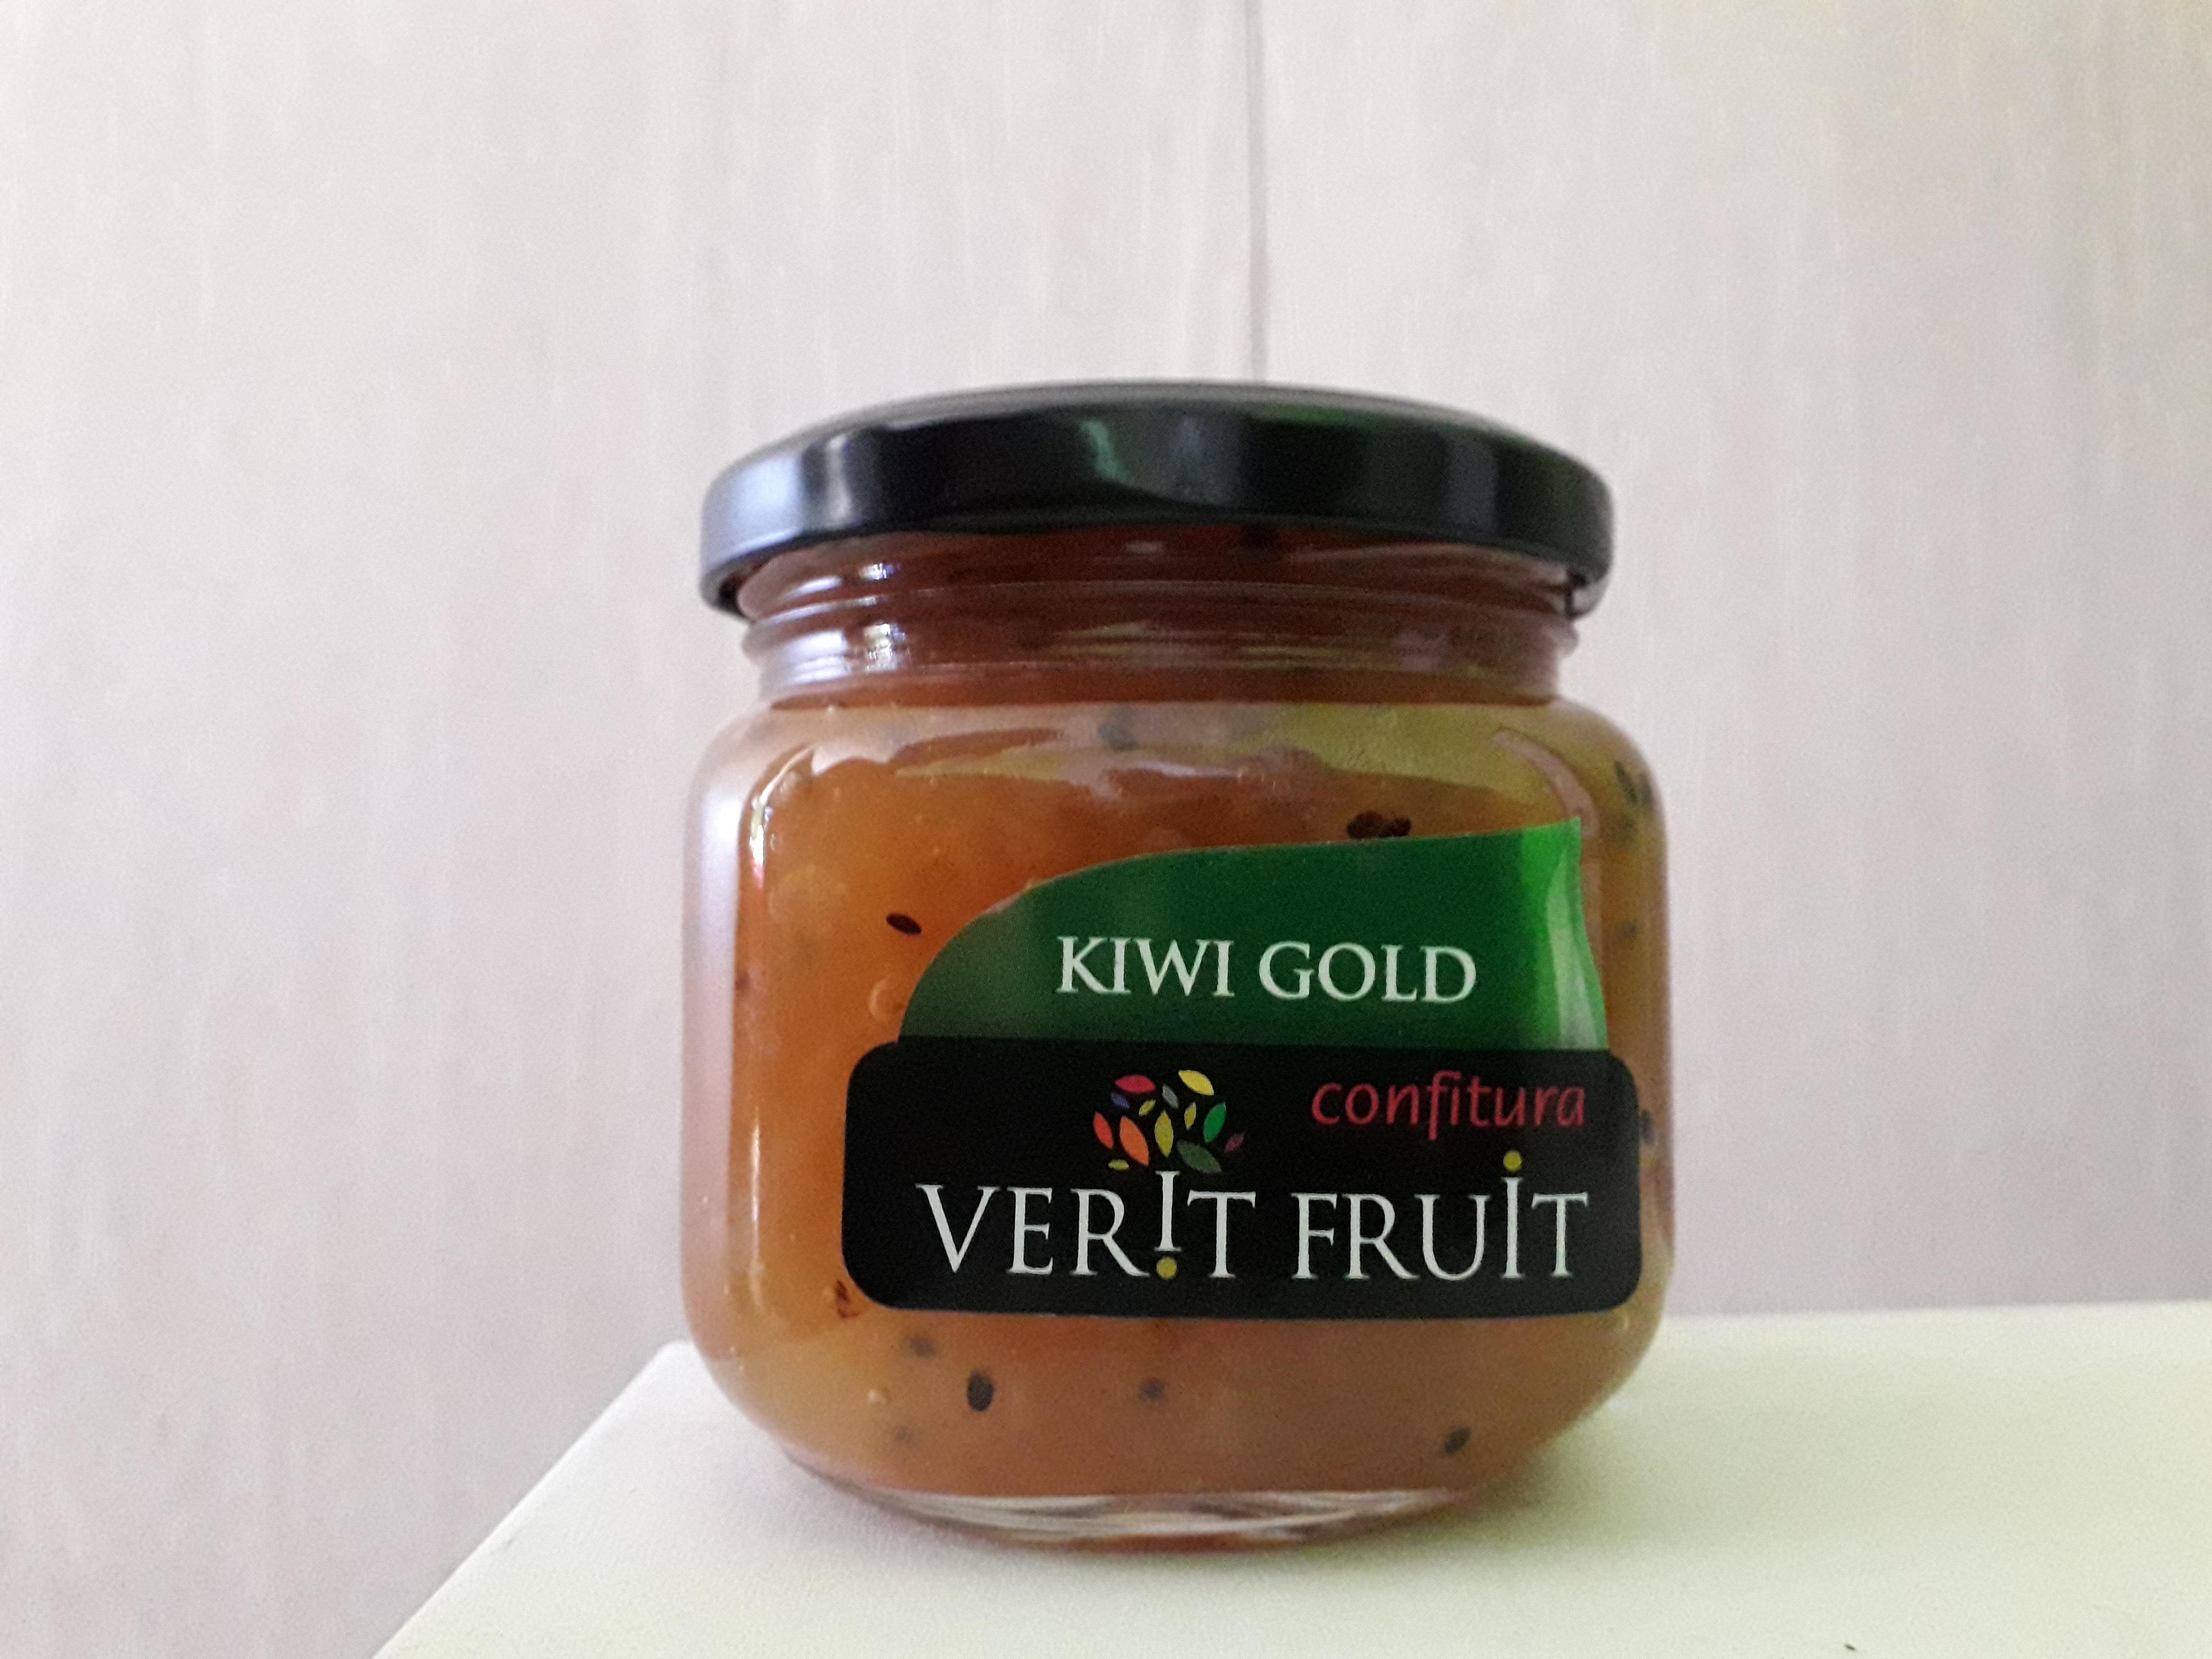 CONFITURA KIWI GOLD